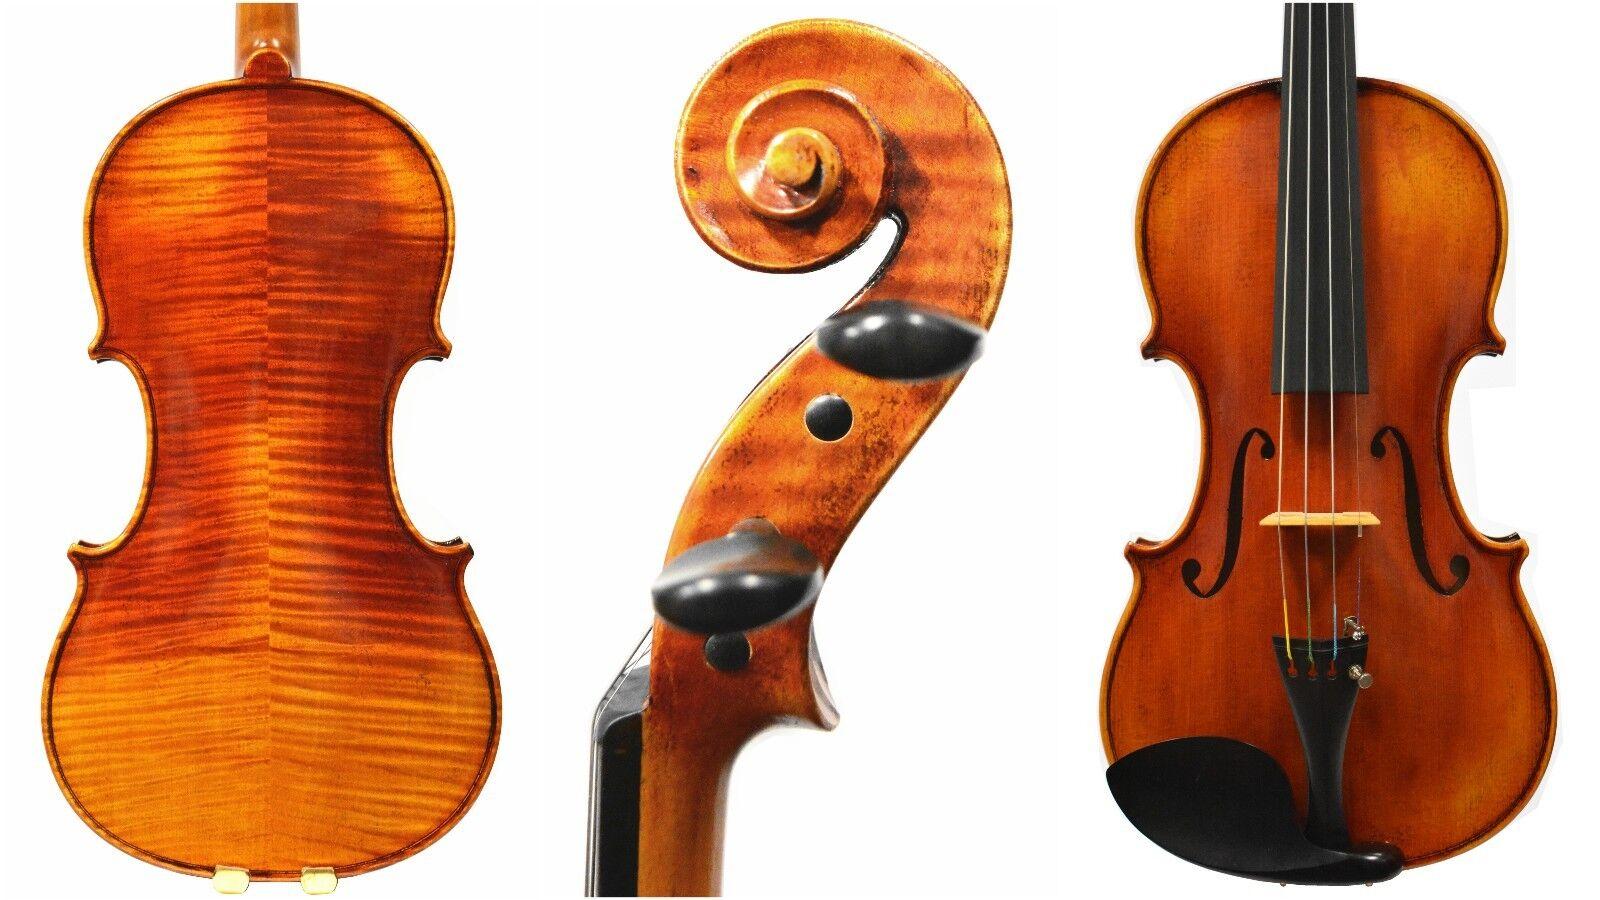 G.Guarneri del Gesu' 1722 4 4 storlek, Antique varnish  Dominant strings, ADVANCED